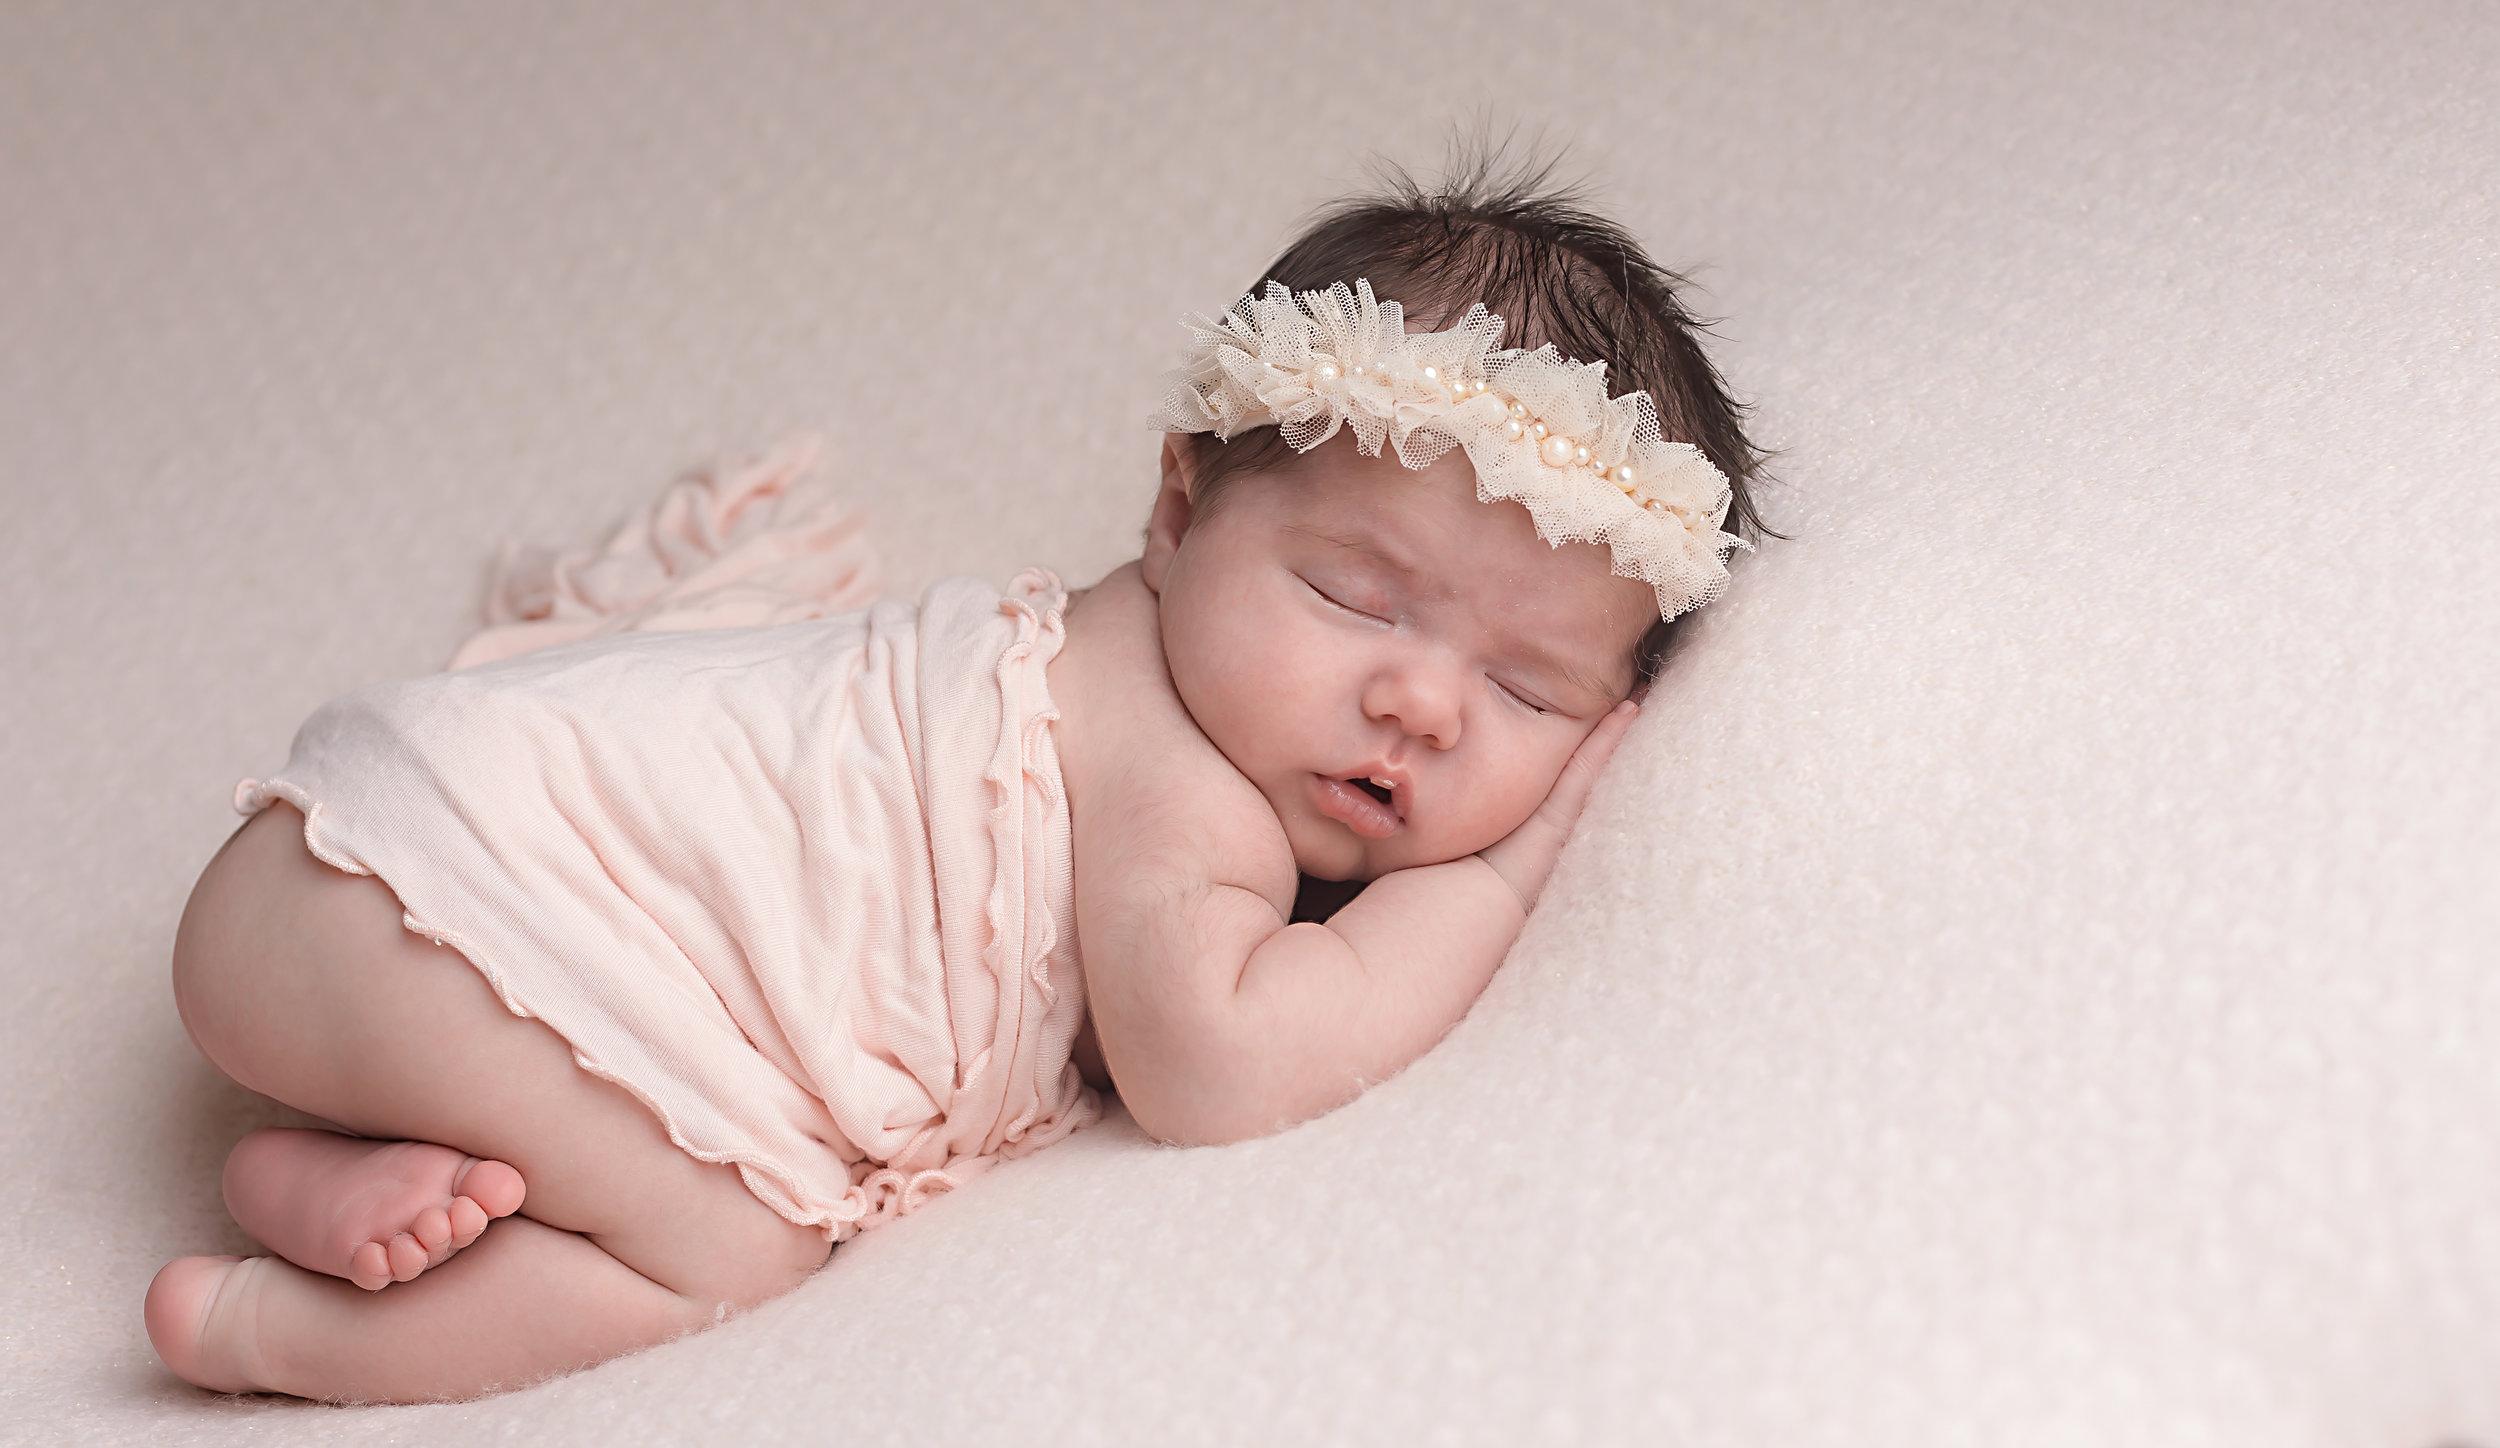 Danirosephotography.newbornphotographeraberdeen.babyphotography.3.jpg